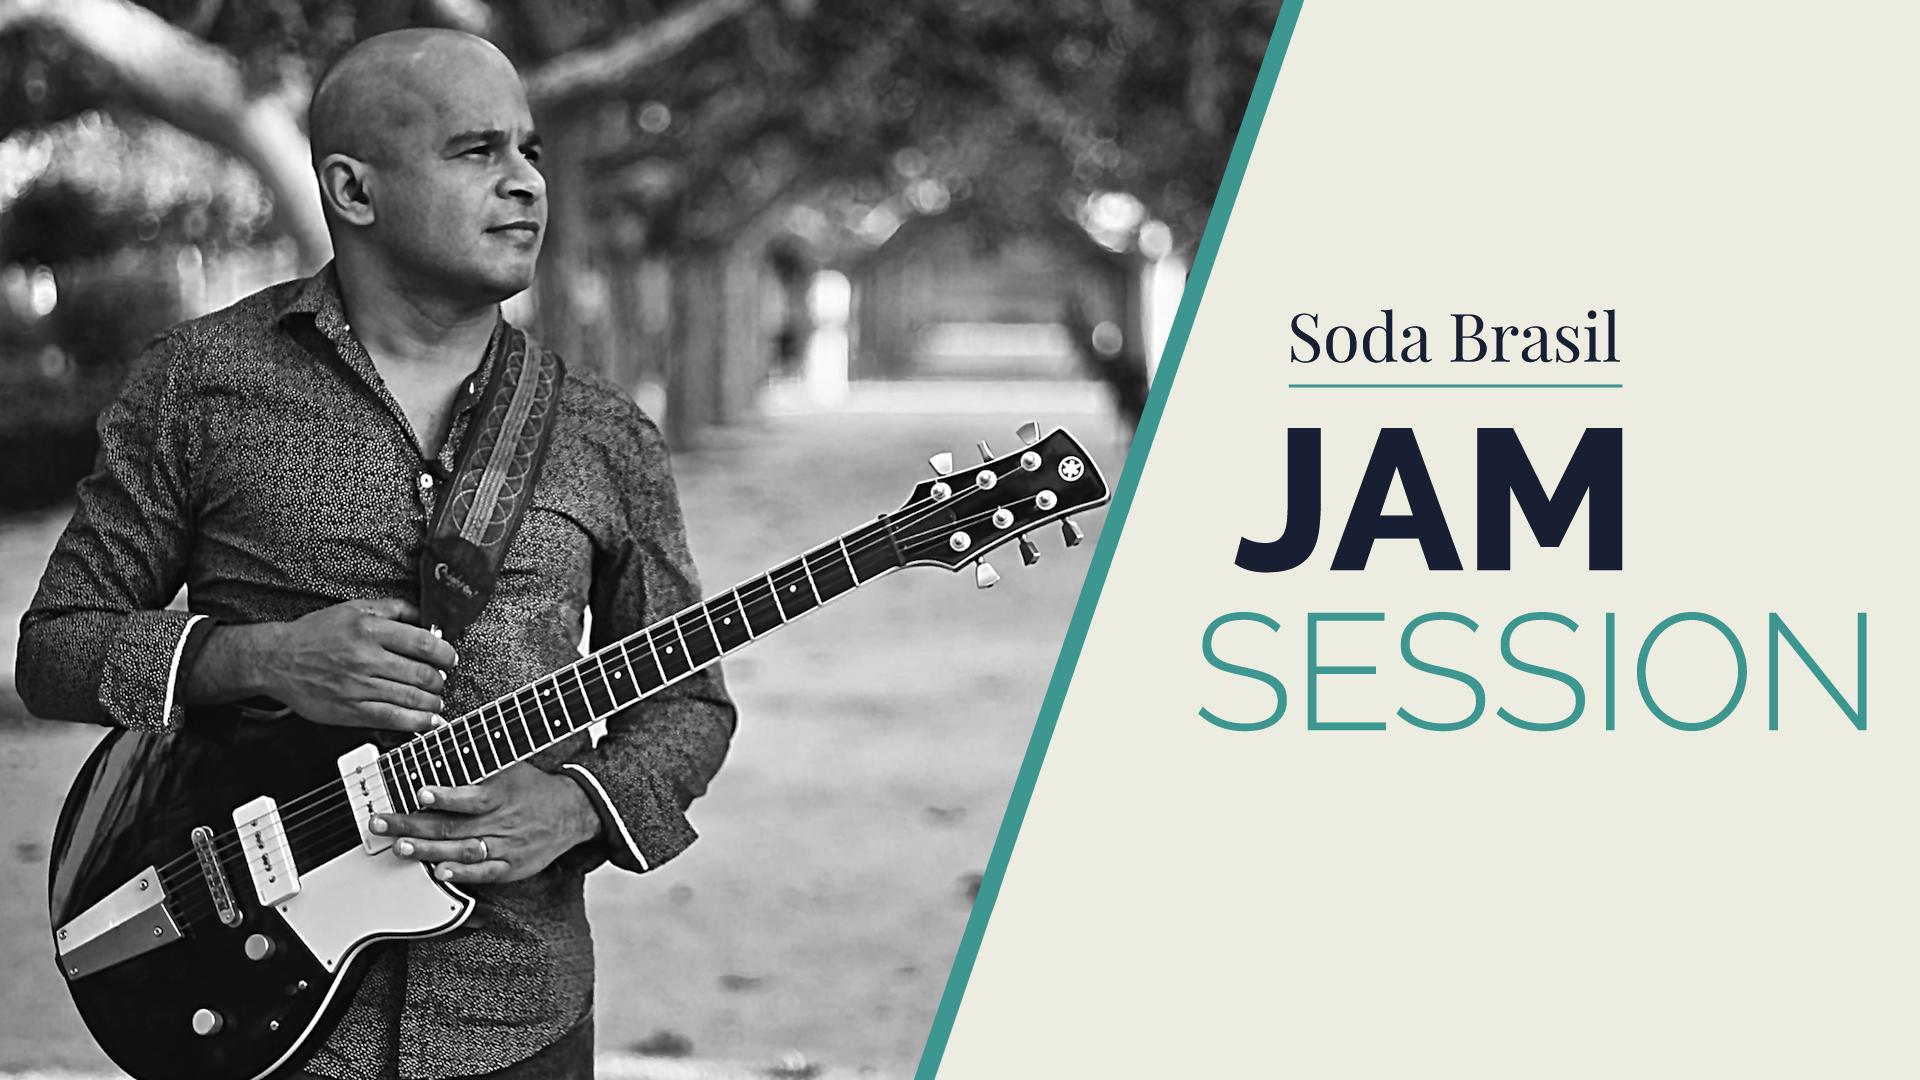 Soda Brazil Jam Session (+ Jurandir Santana)